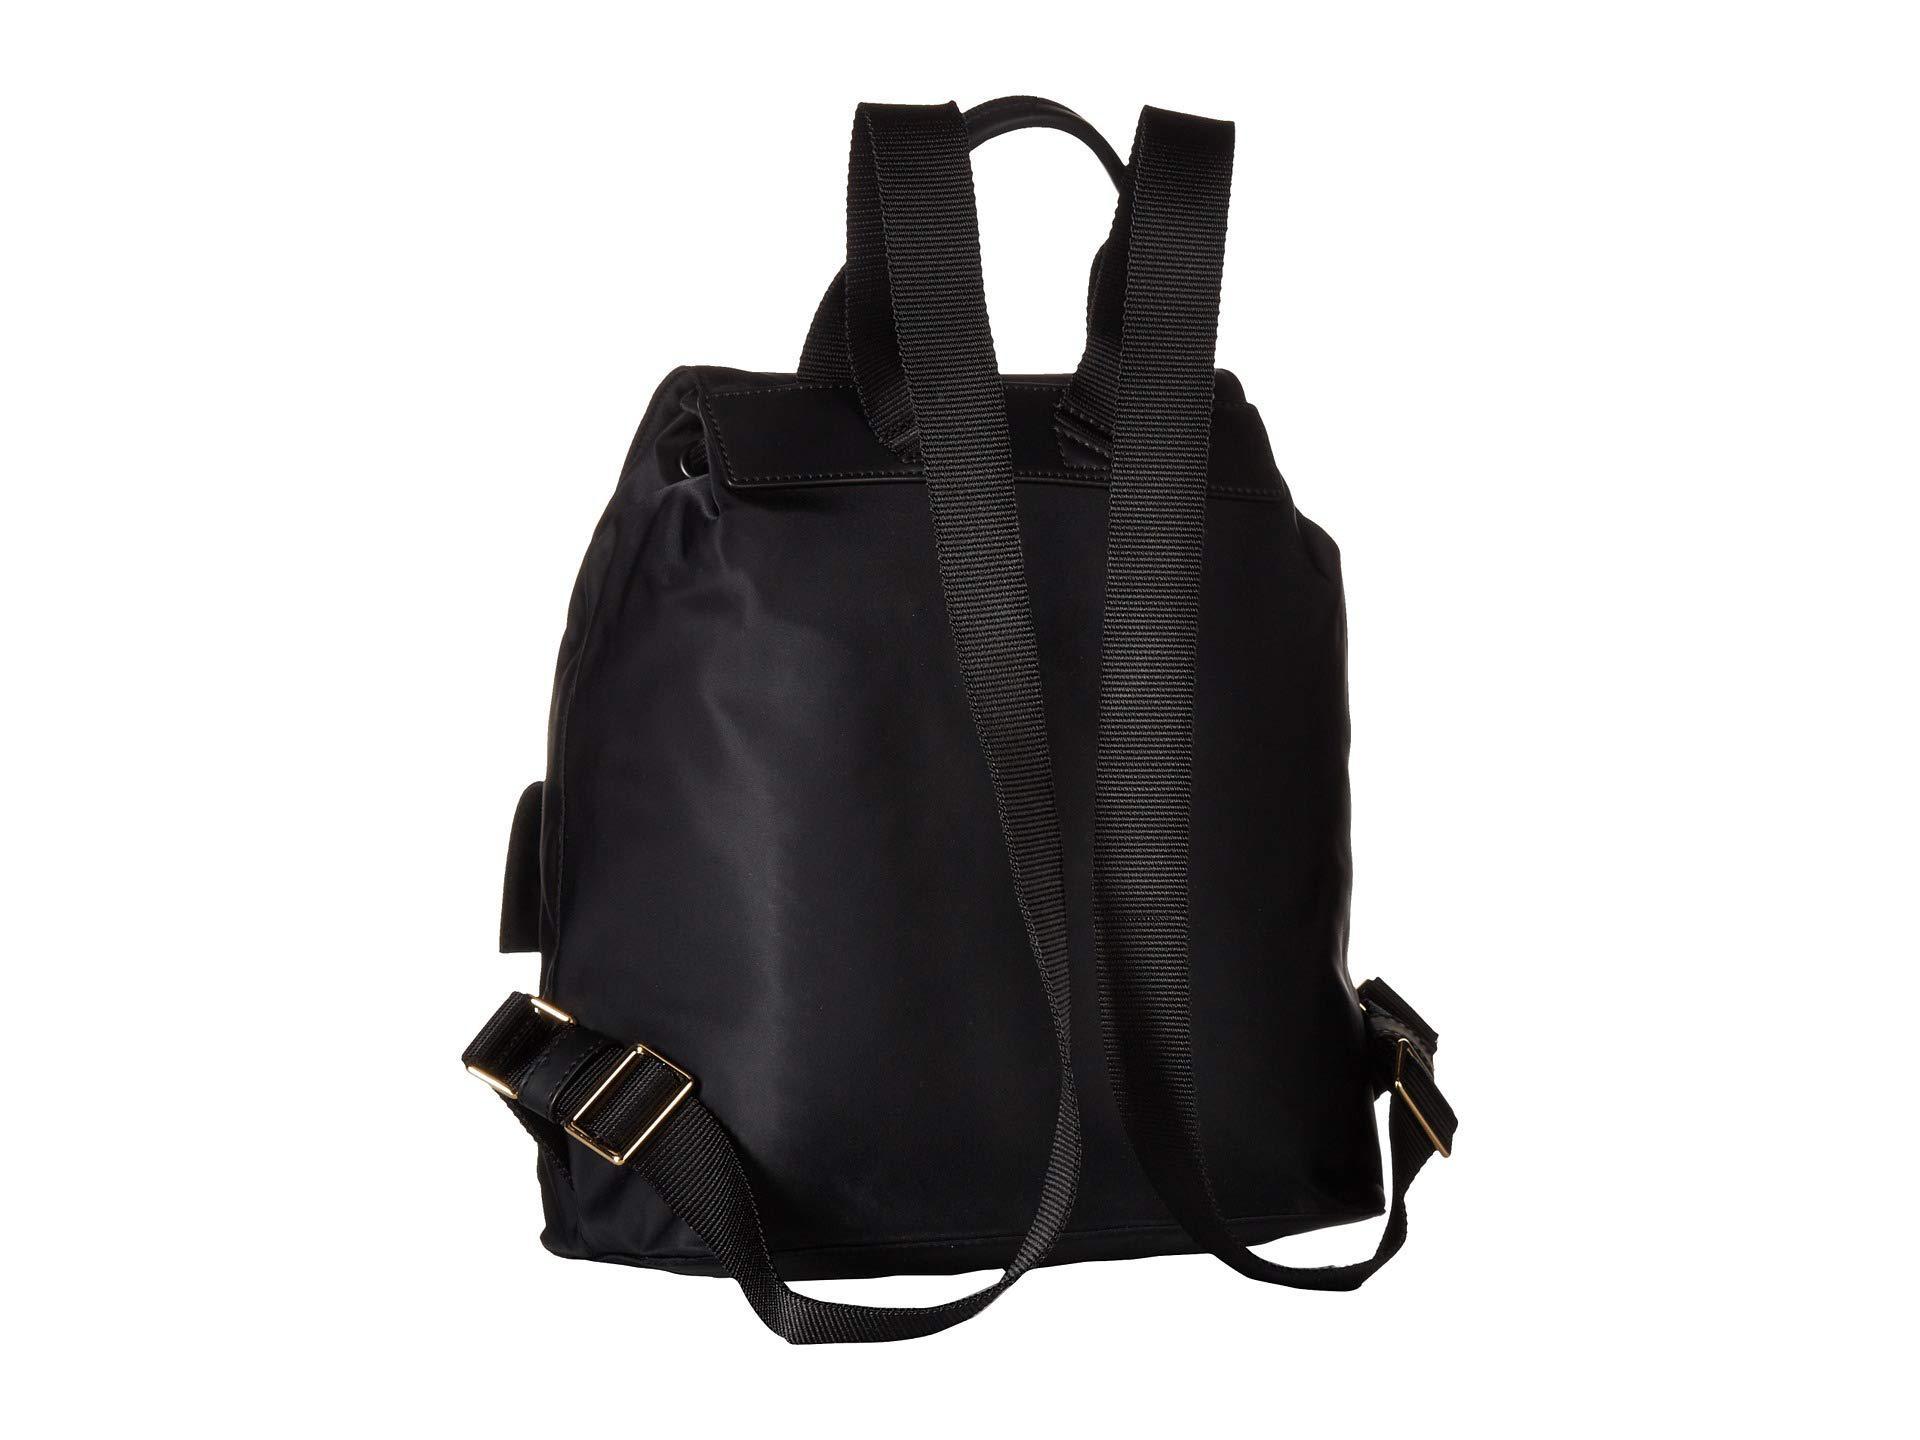 9a1fe059e1d Tory Burch - Tilda Nylon Flap Backpack (black) Backpack Bags - Lyst. View  fullscreen